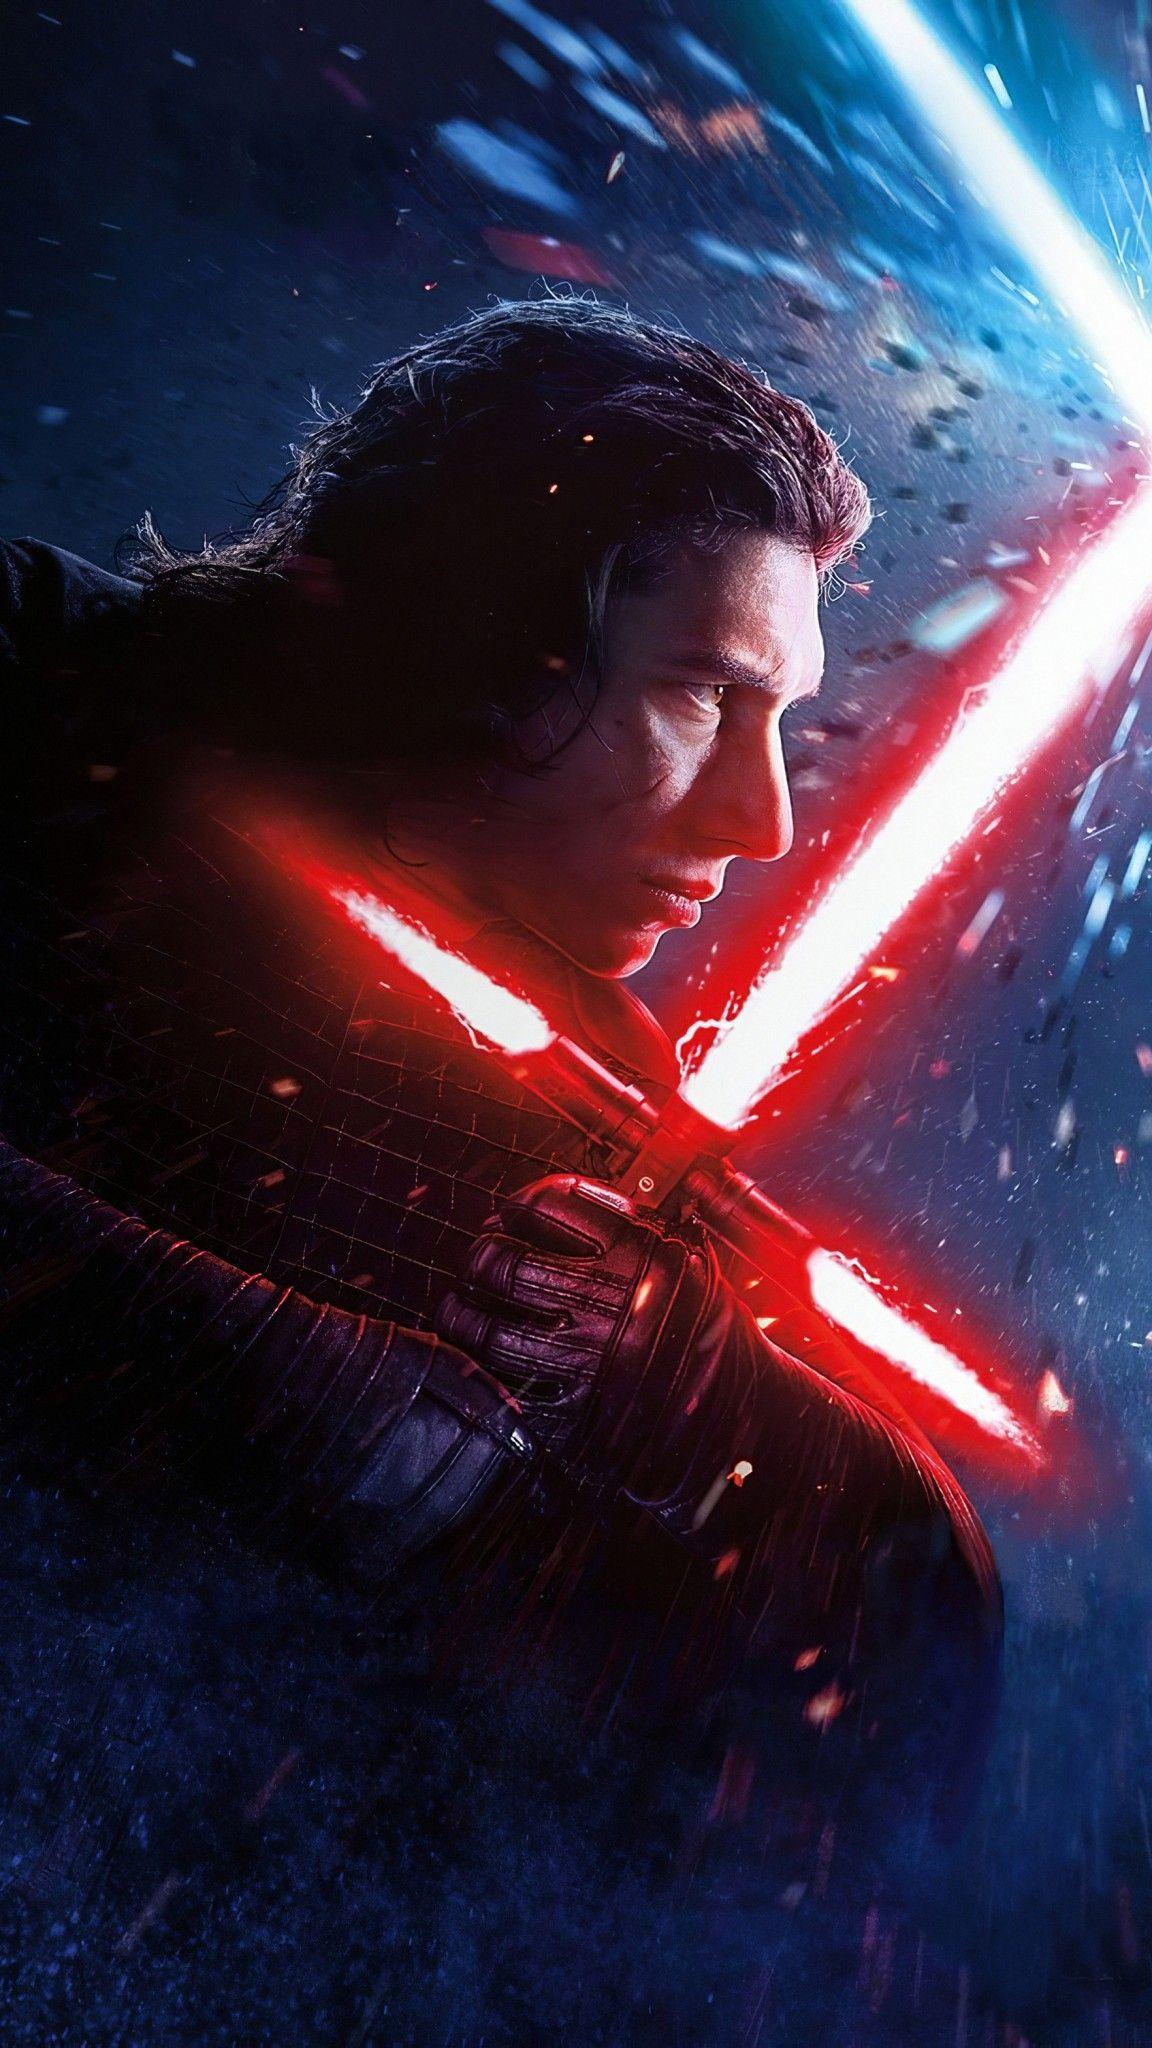 Pin by Daniel Johnson on star wars in 2020 Rey star wars